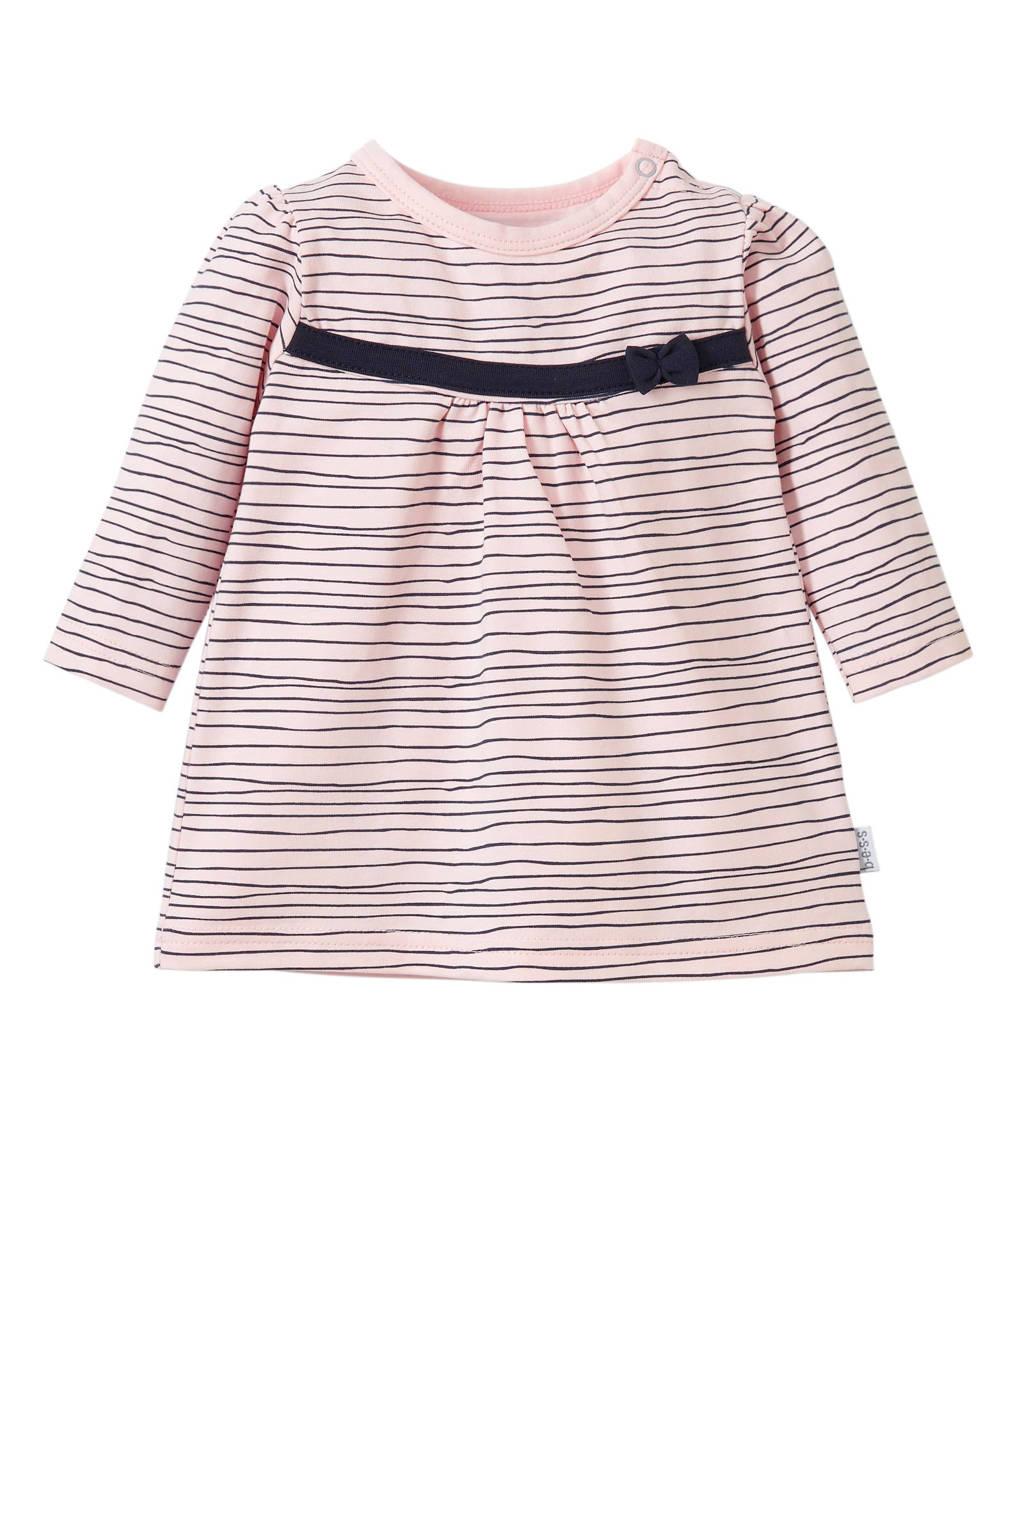 B.E.S.S newborn baby jurk, Lichtroze